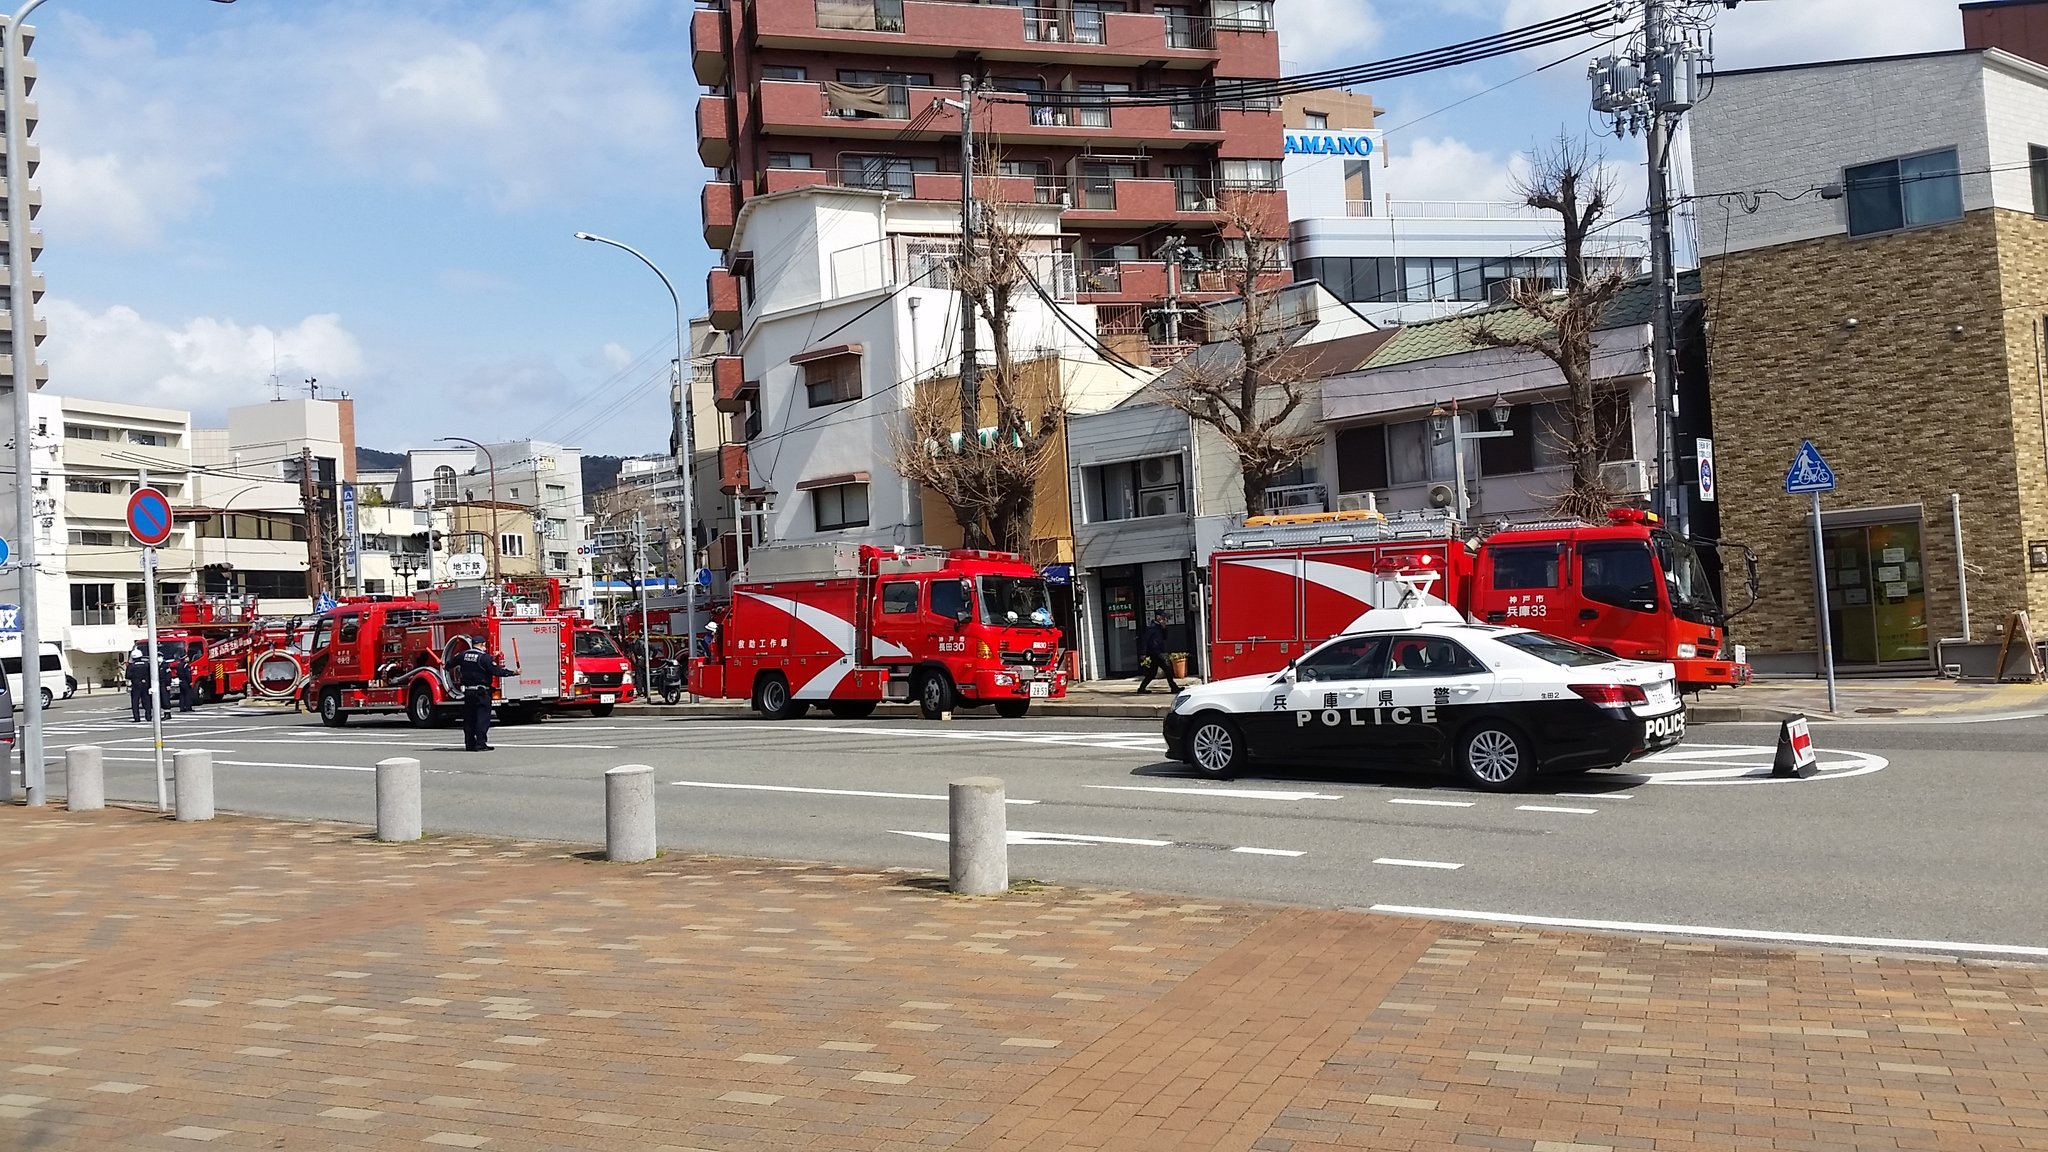 画像,大倉山で高層建物火災。#火災#火事#大倉山#神戸市 https://t.co/TjecpFlRSV。